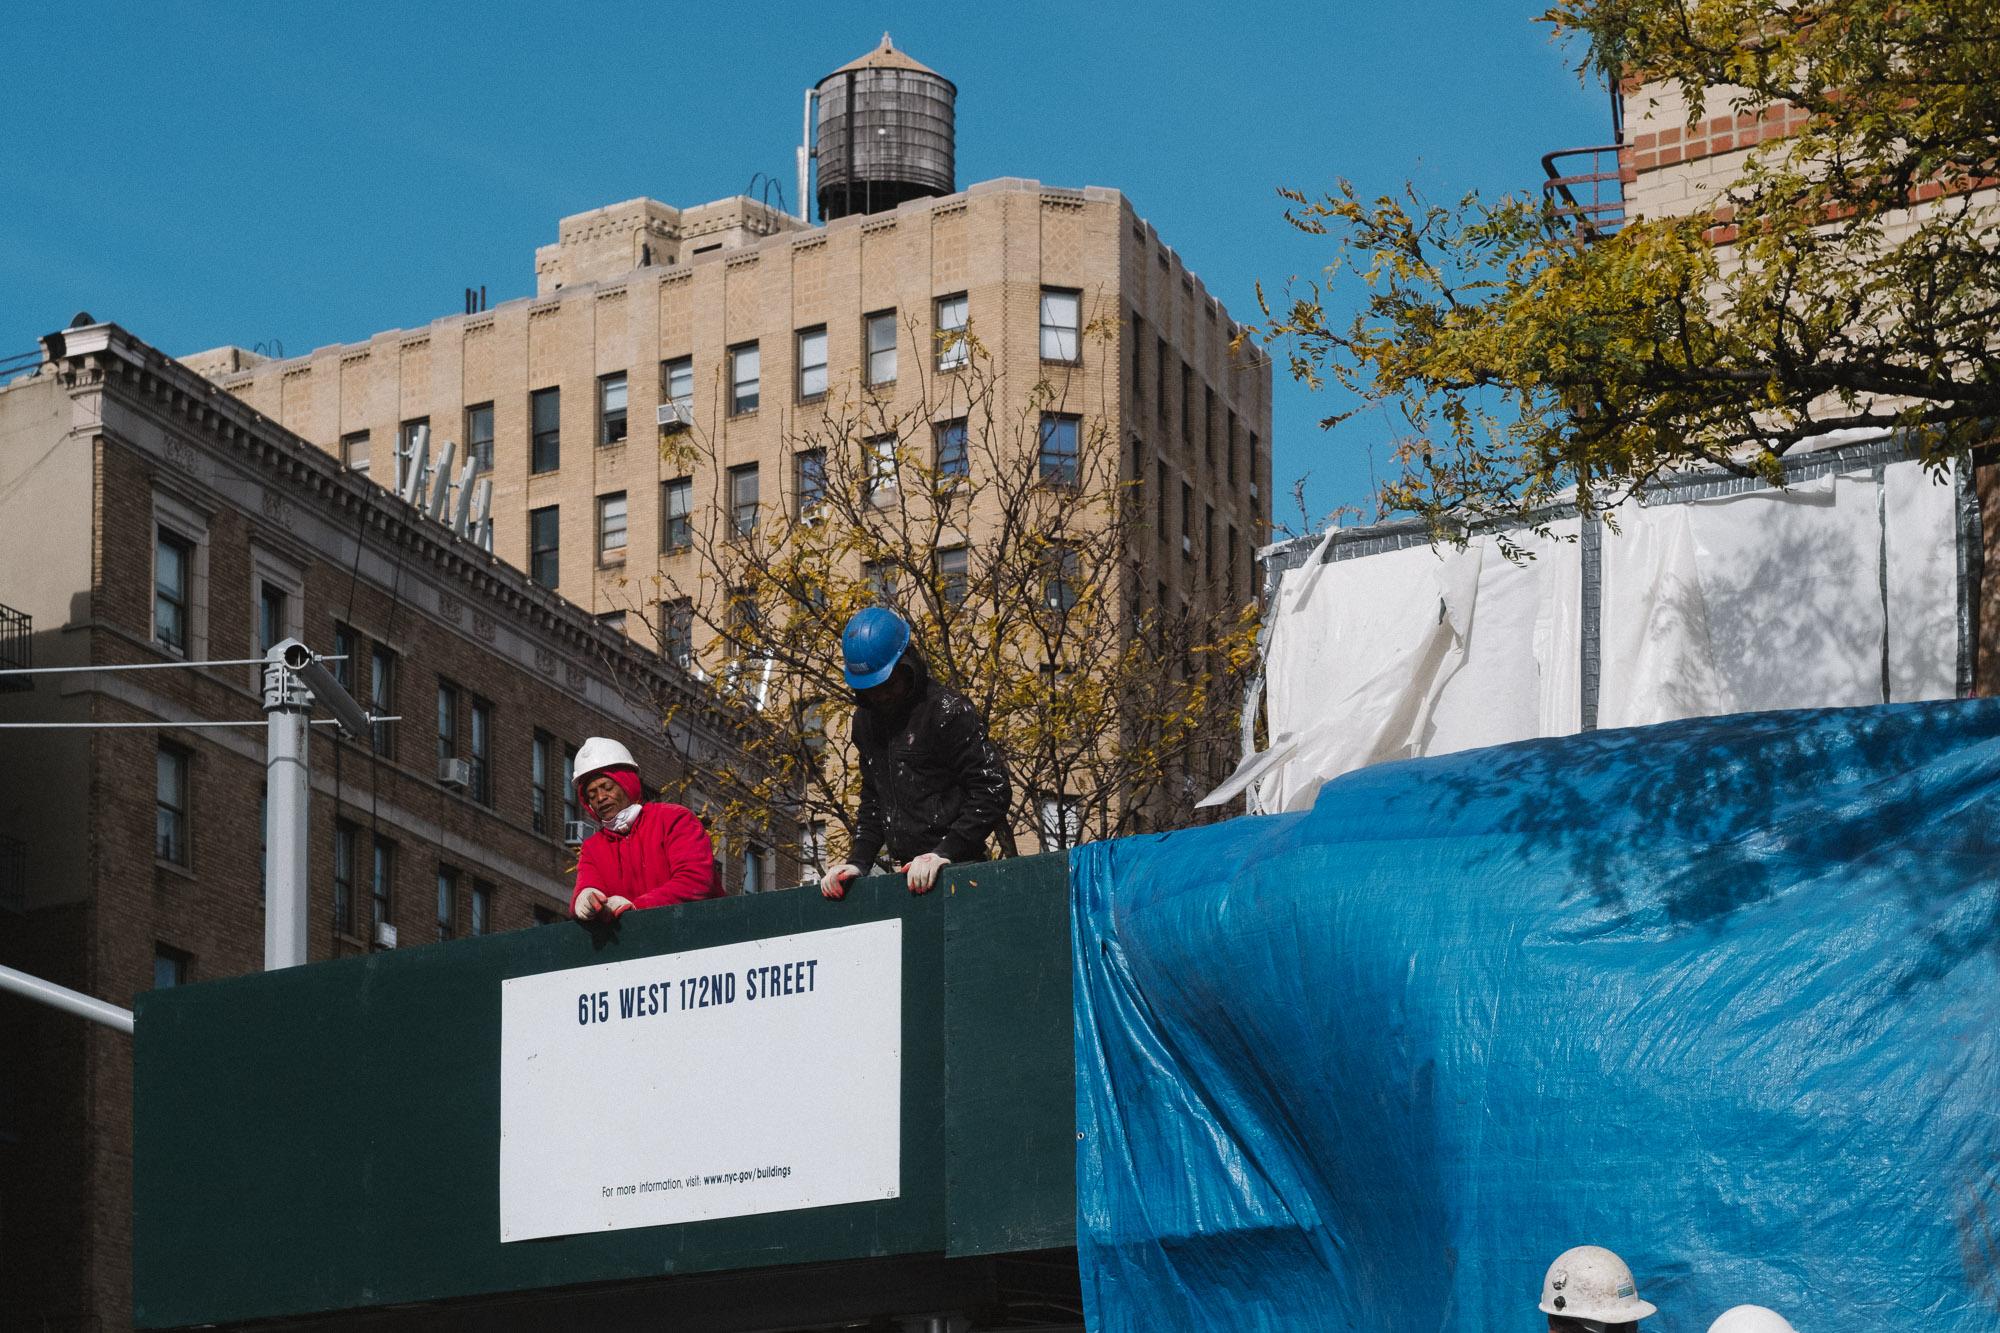 Construction workers in Washington Heights, Manhattan. Fuji X-Pro 2, Helios 44-4.